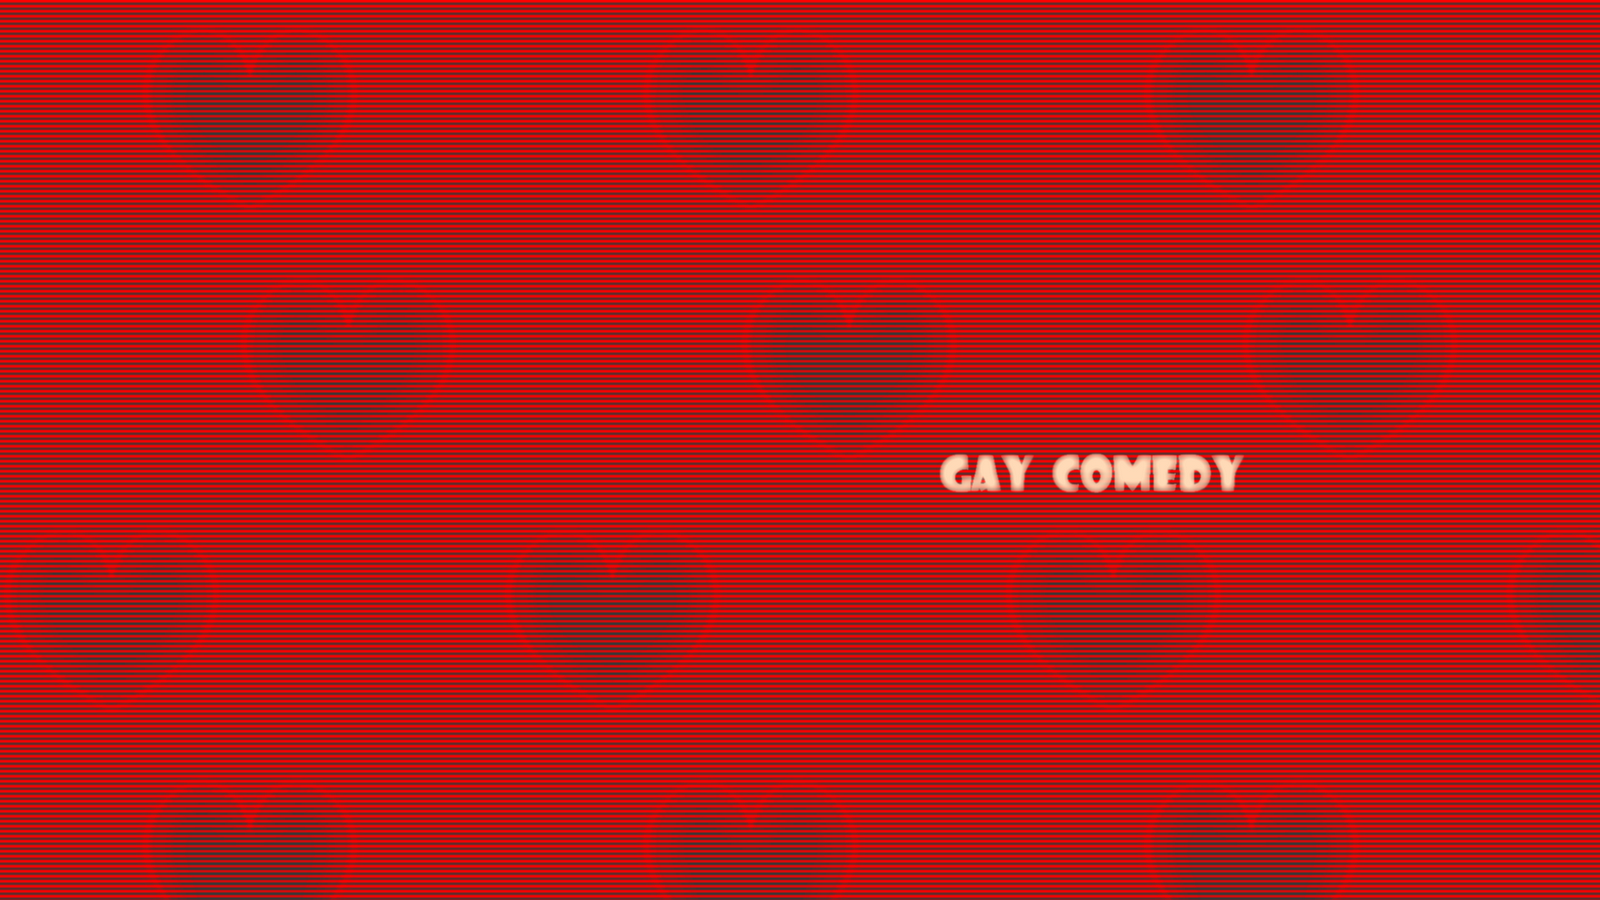 LGBTWALLPAPERSGAYLESBIANPRIDERAINBOWGAYCOMEDY1png 1600x900